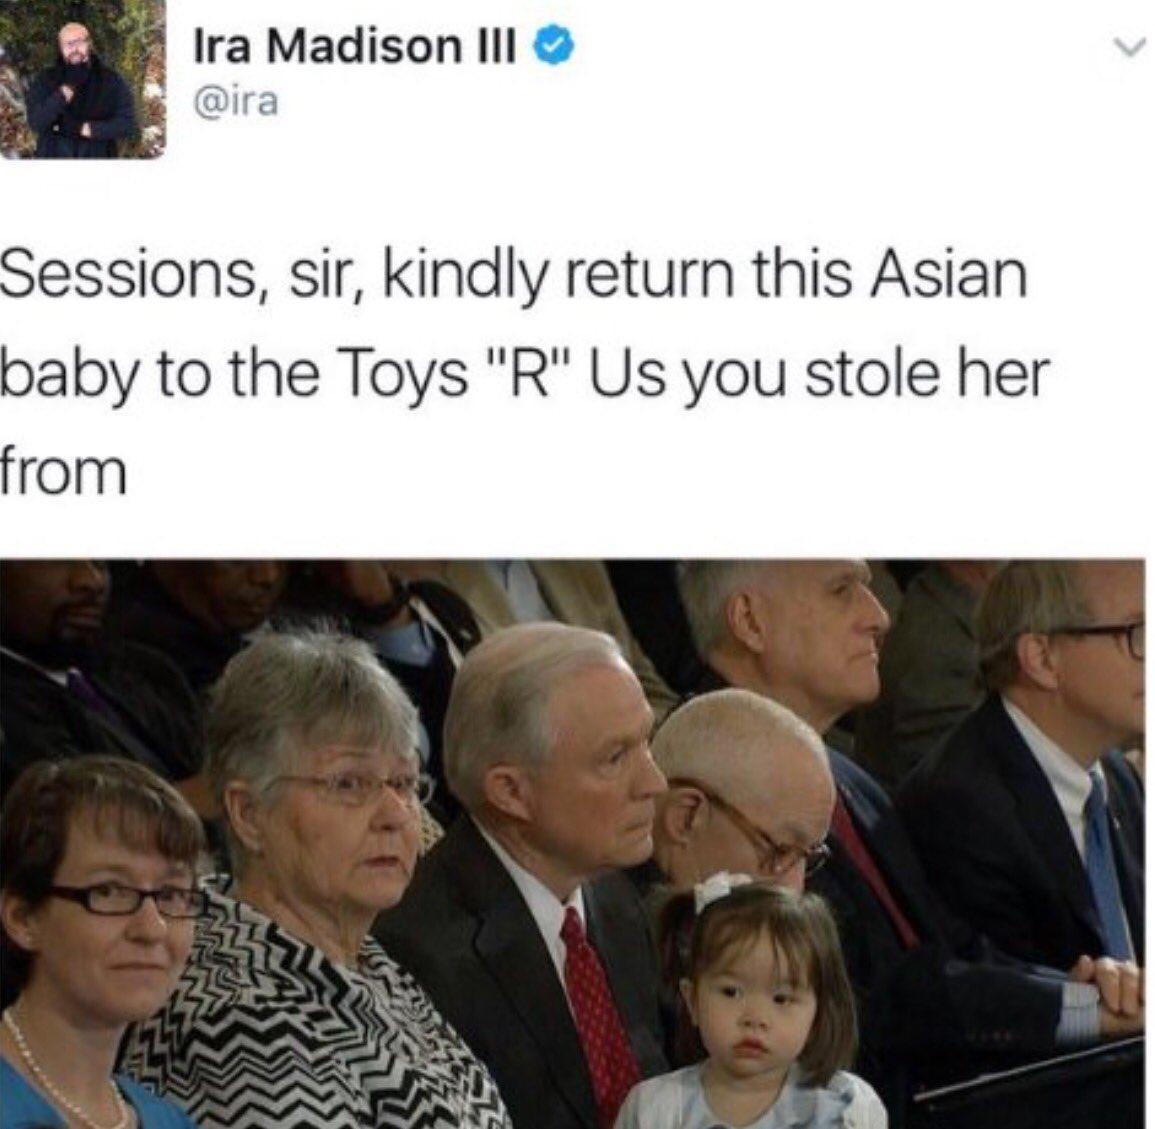 ira_madison